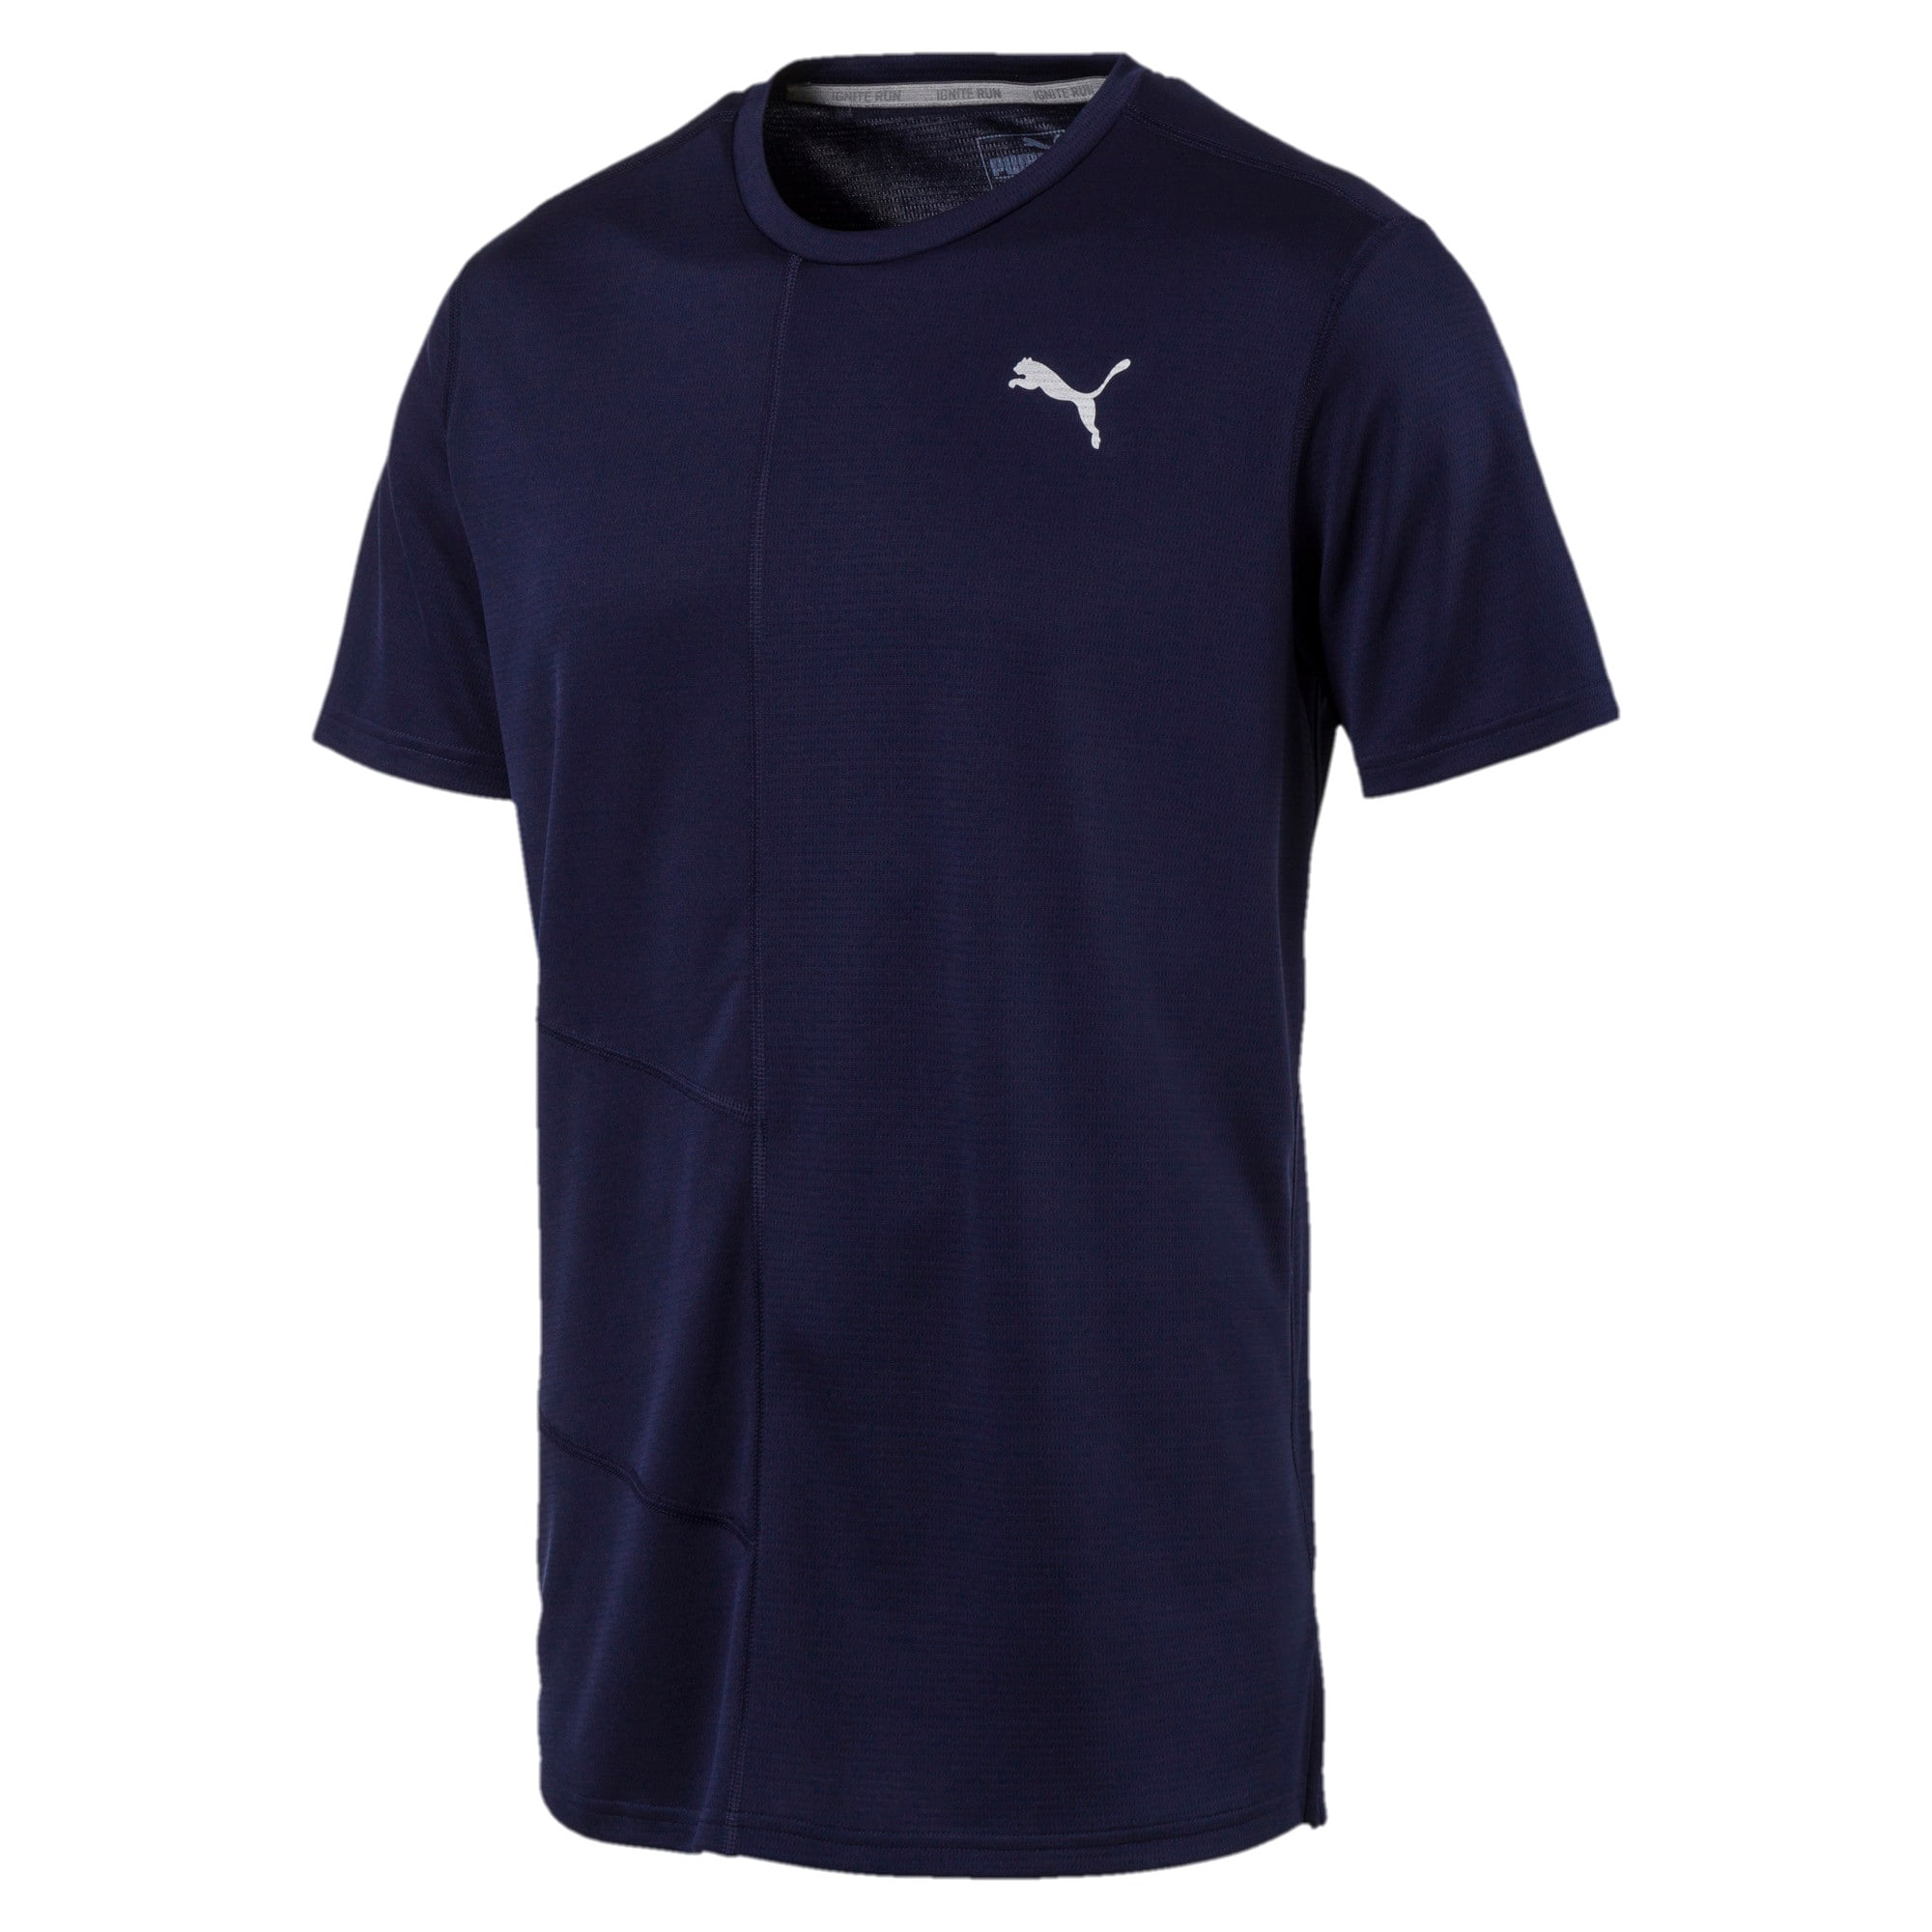 Thumbnail 4 of IGNITE Men's Running T-Shirt, Peacoat, medium